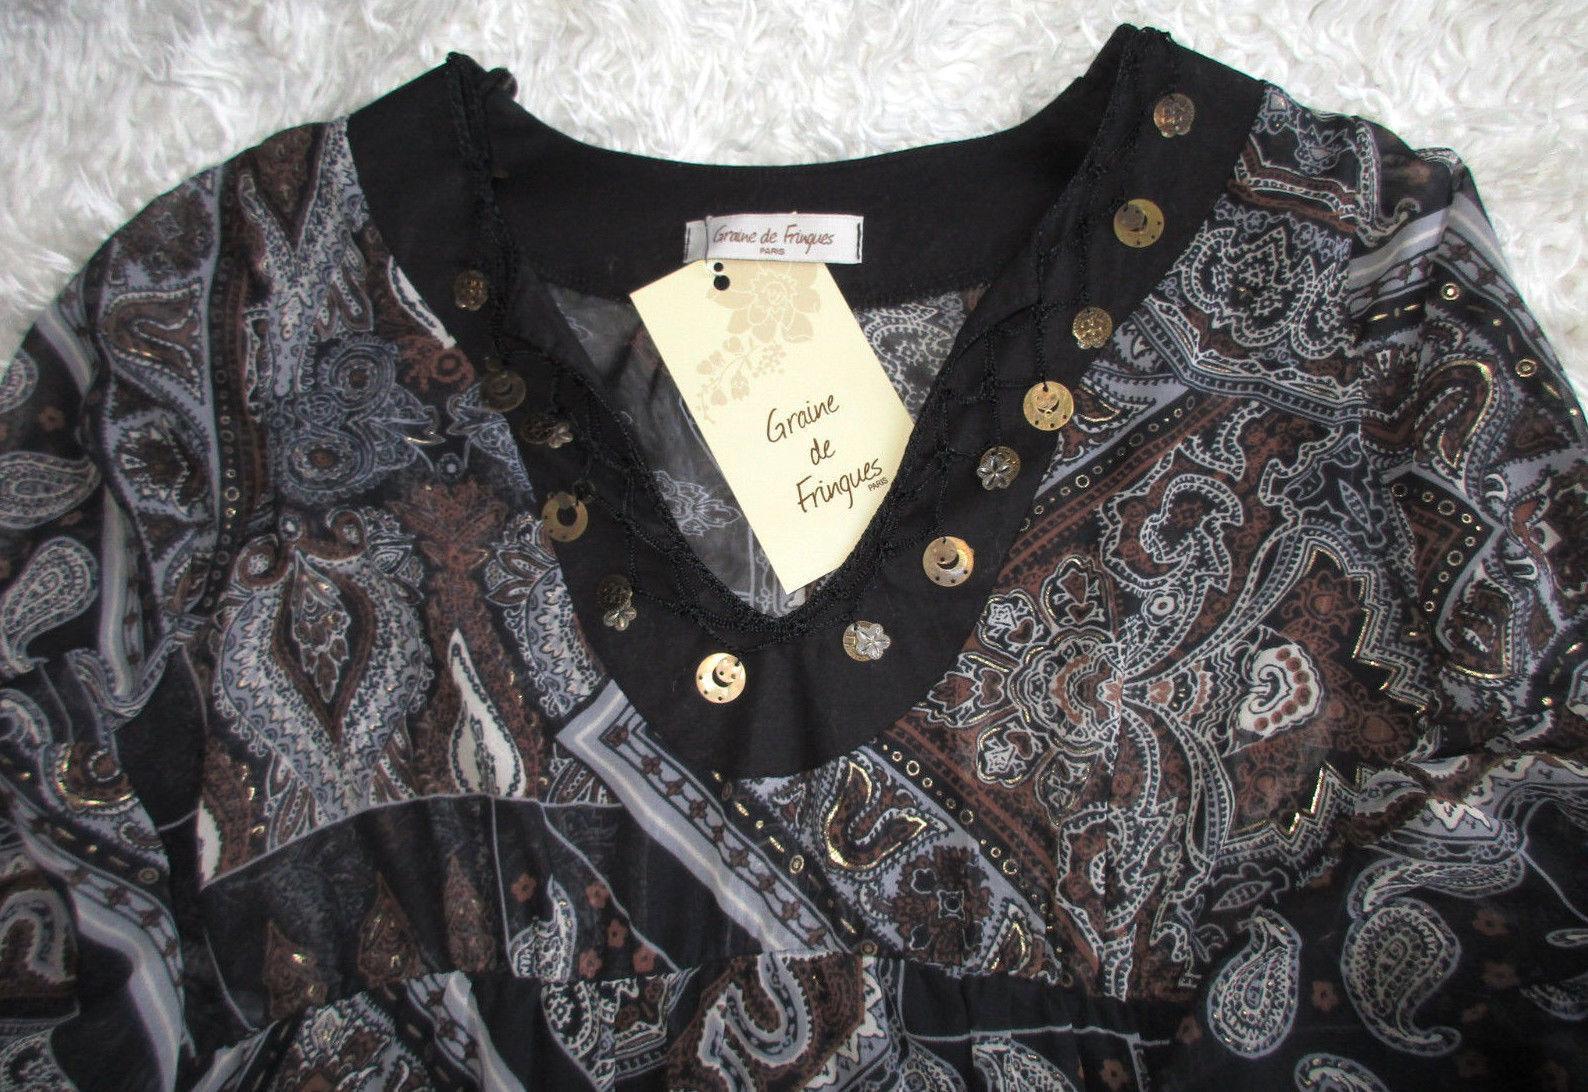 Kleid Designerkleid Gr. 2 - ca. 38- 40 Graine de Fringues Neupreis